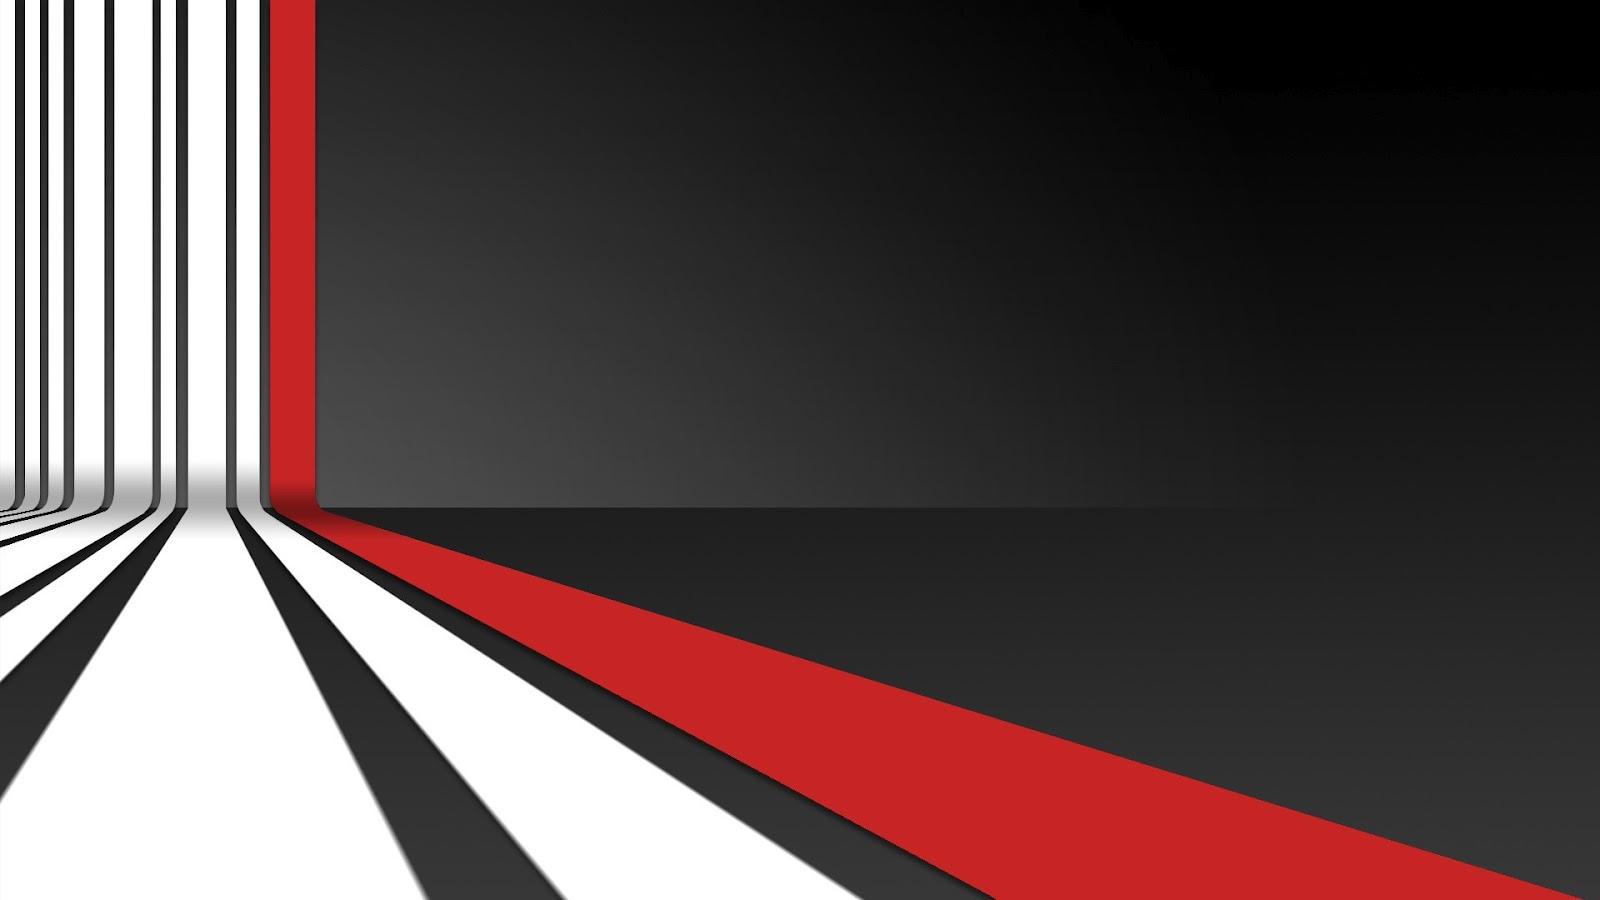 Iphone wallpaper black and red 12 desktop background for Black and red wallpaper